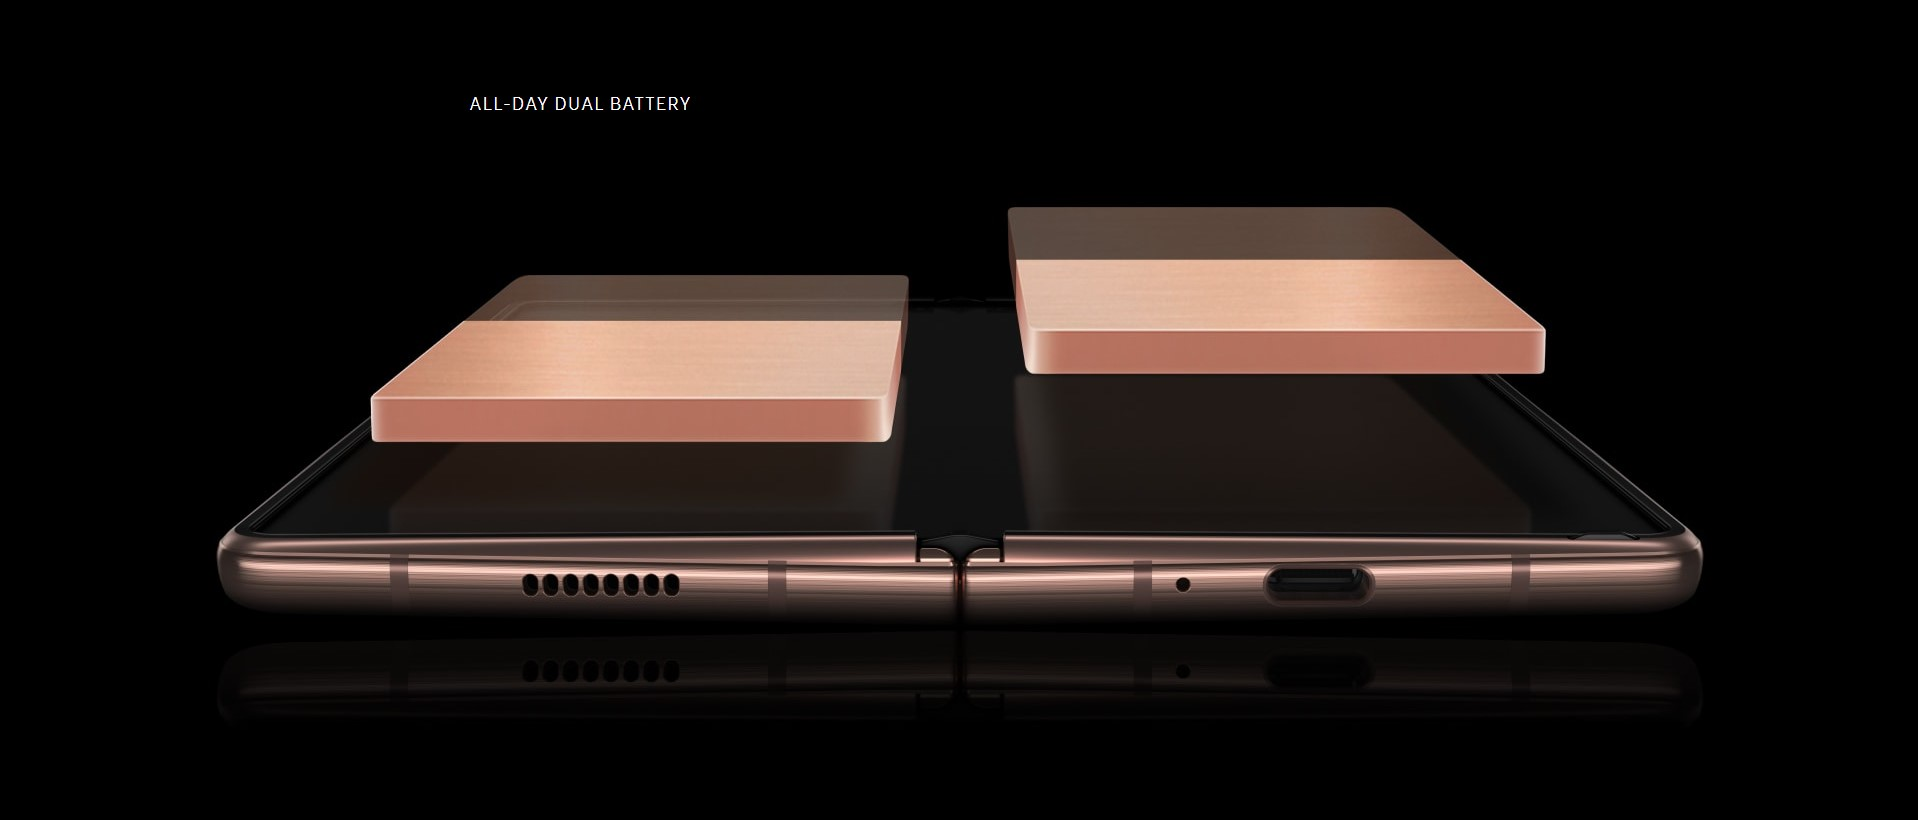 Samsung Galaxy Z Fold 2 Dual Battery